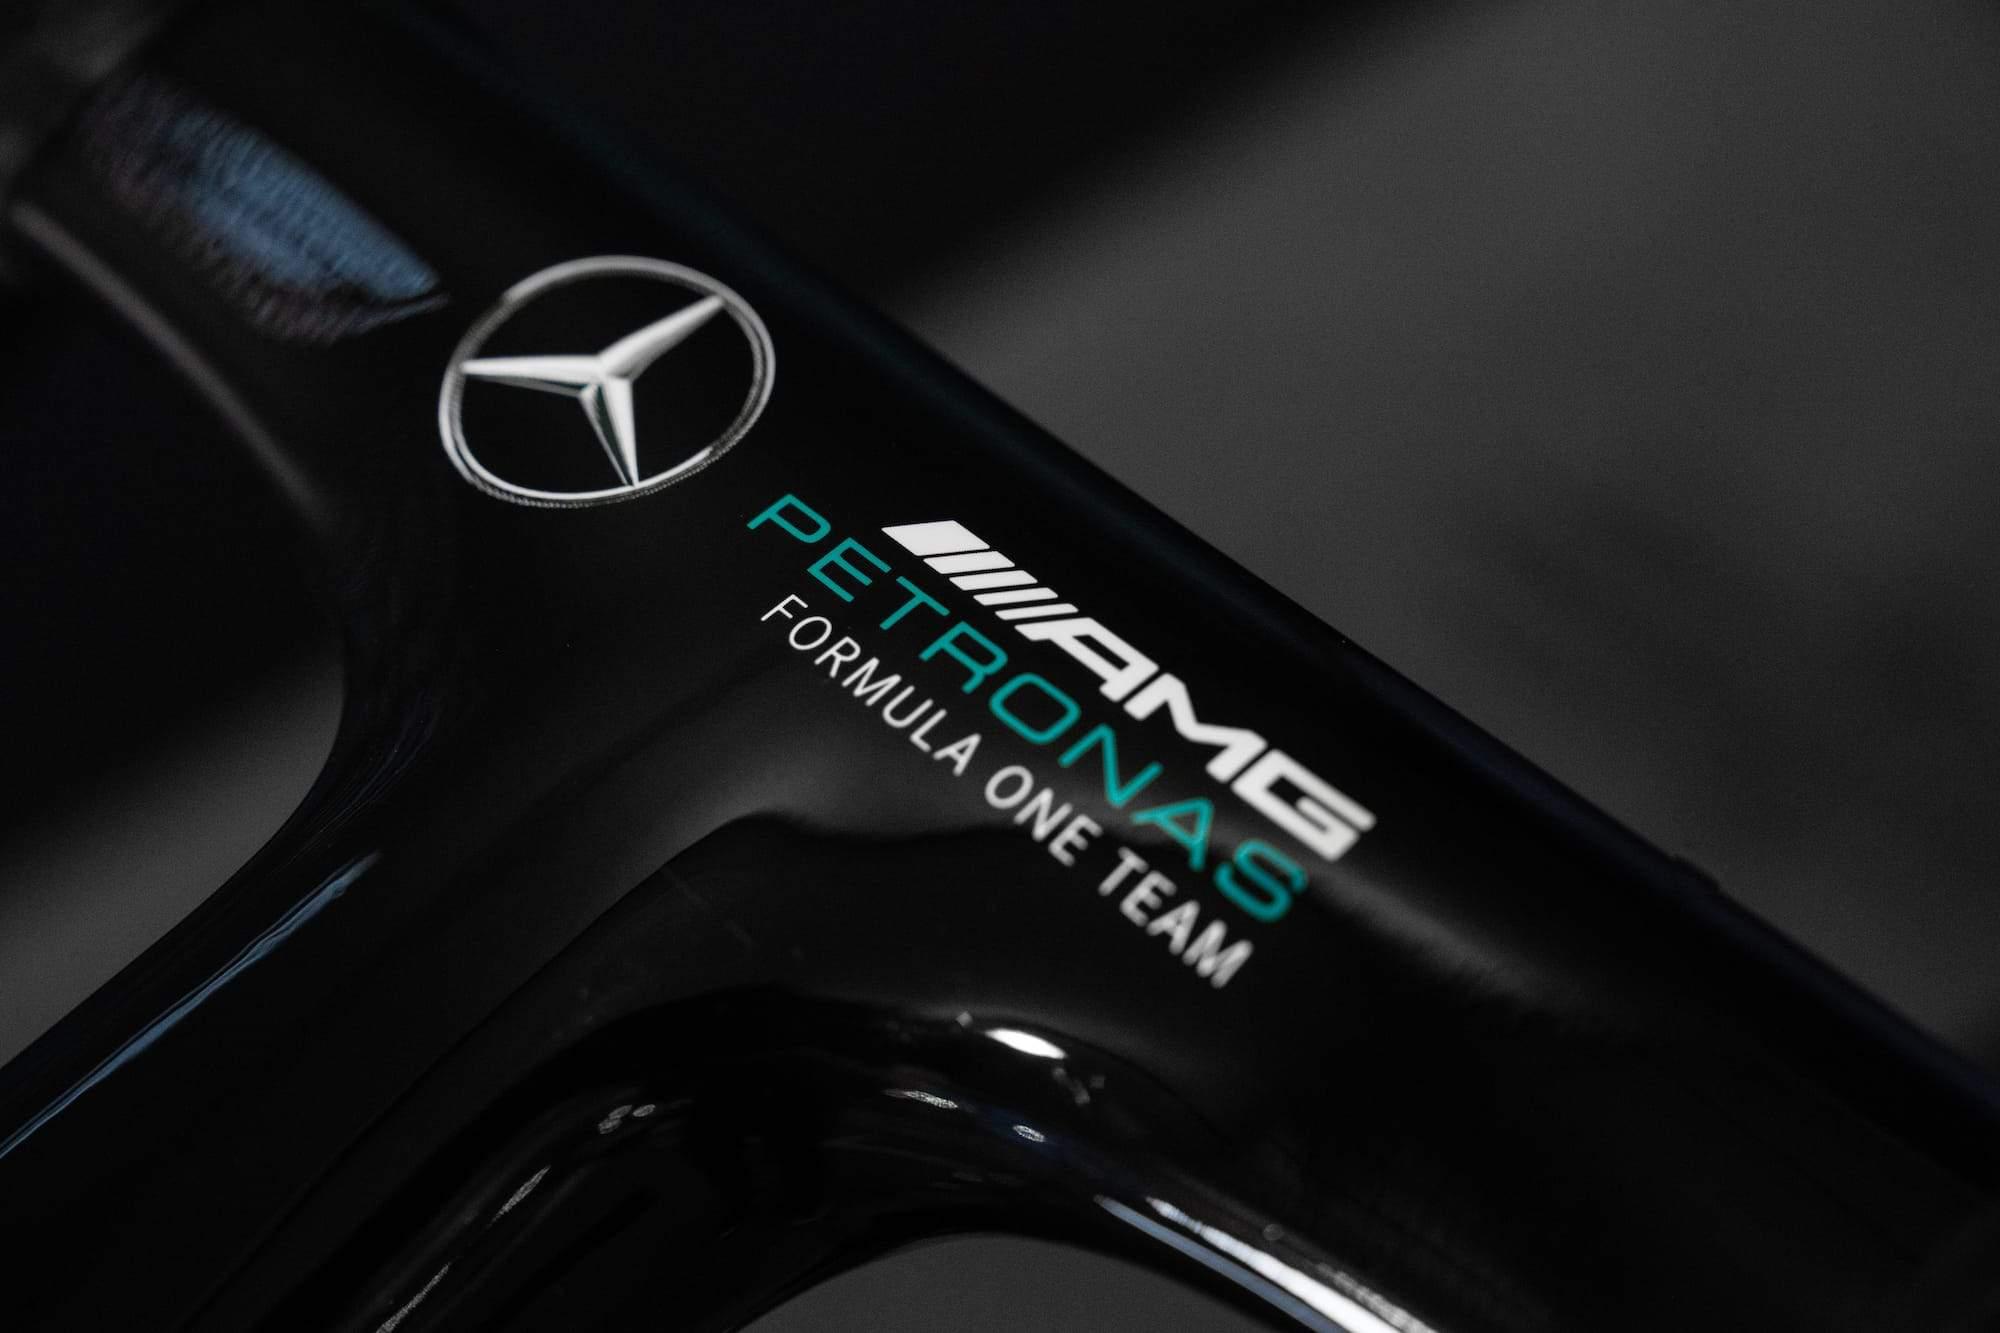 mercedes AMG Petronas team formula one